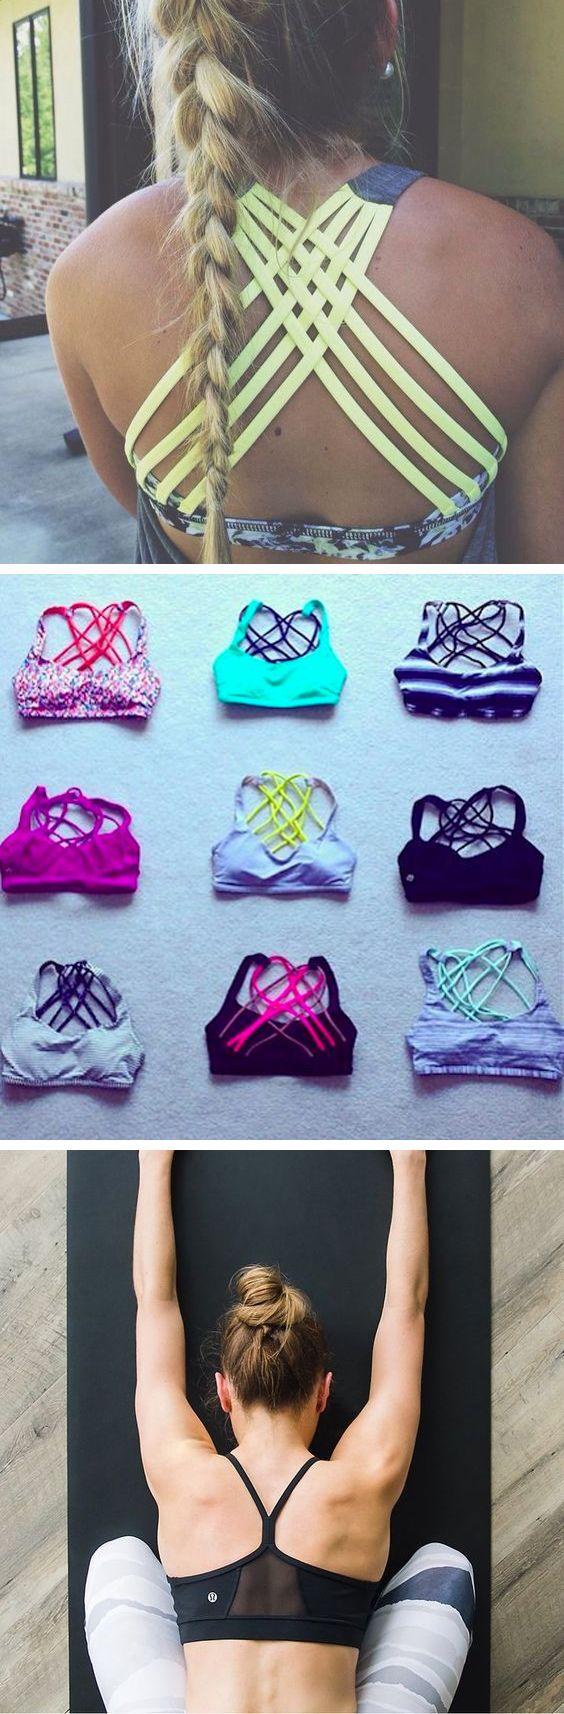 best workout gear